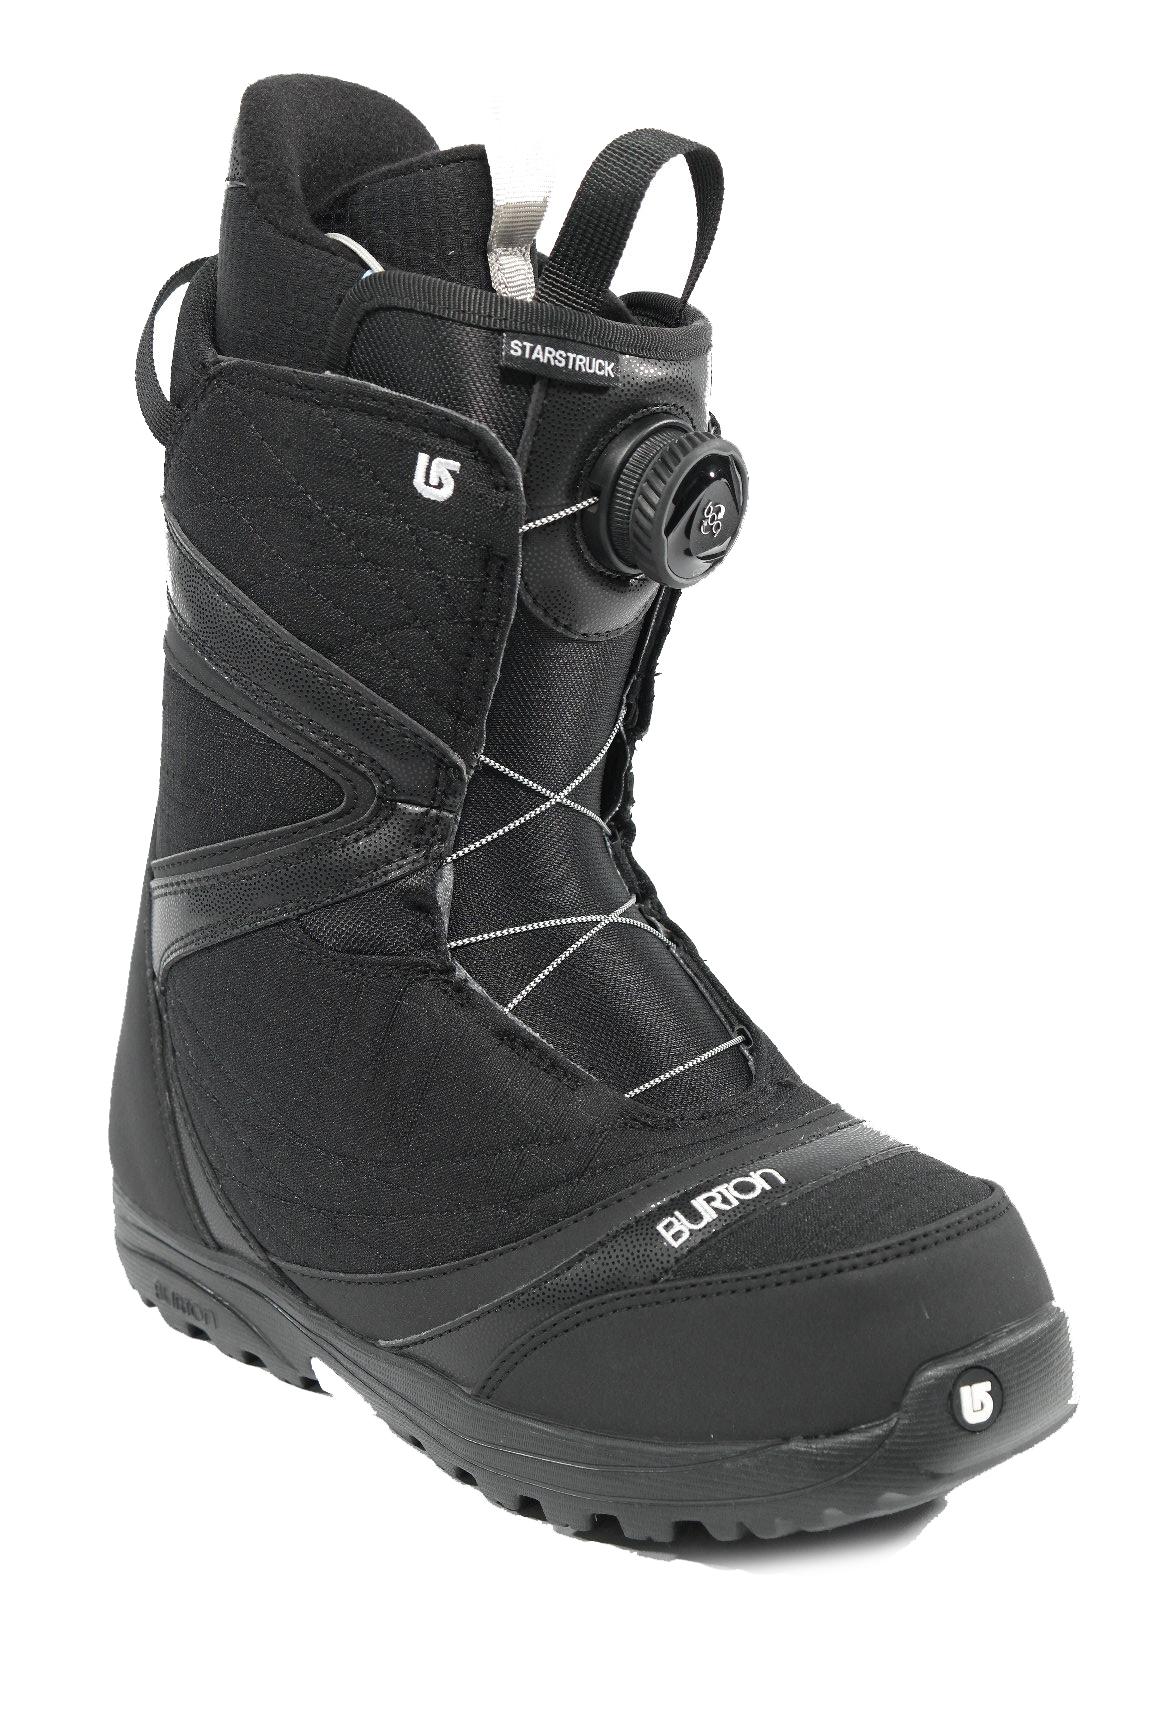 Burton Starstruck Boa Dames snowboard schoenen zwart ...